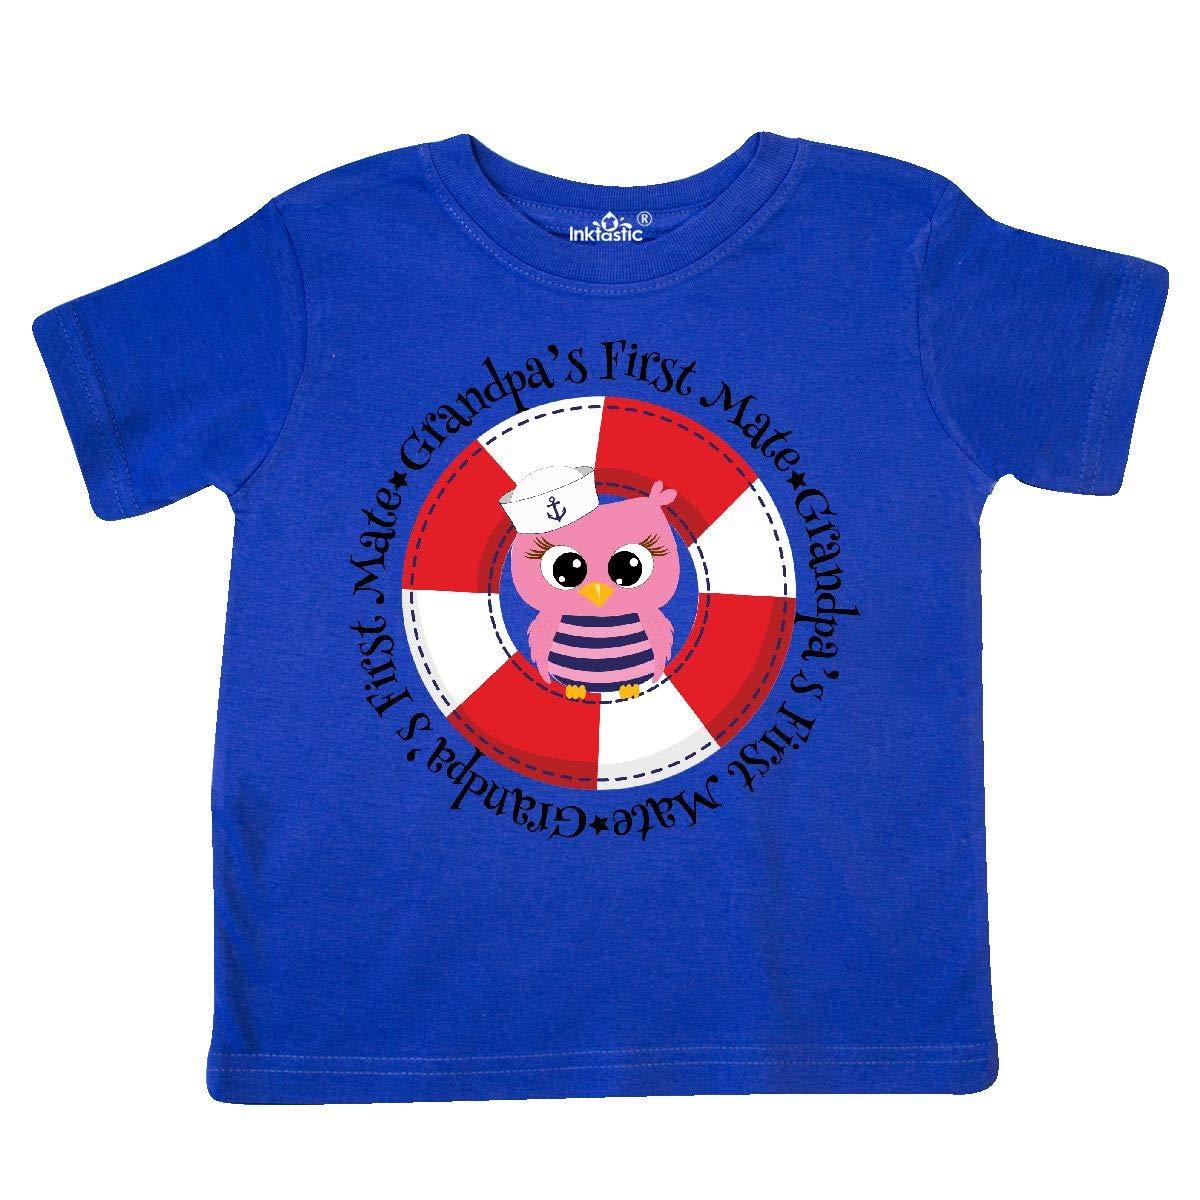 inktastic Grandpas First Mate Toddler T-Shirt